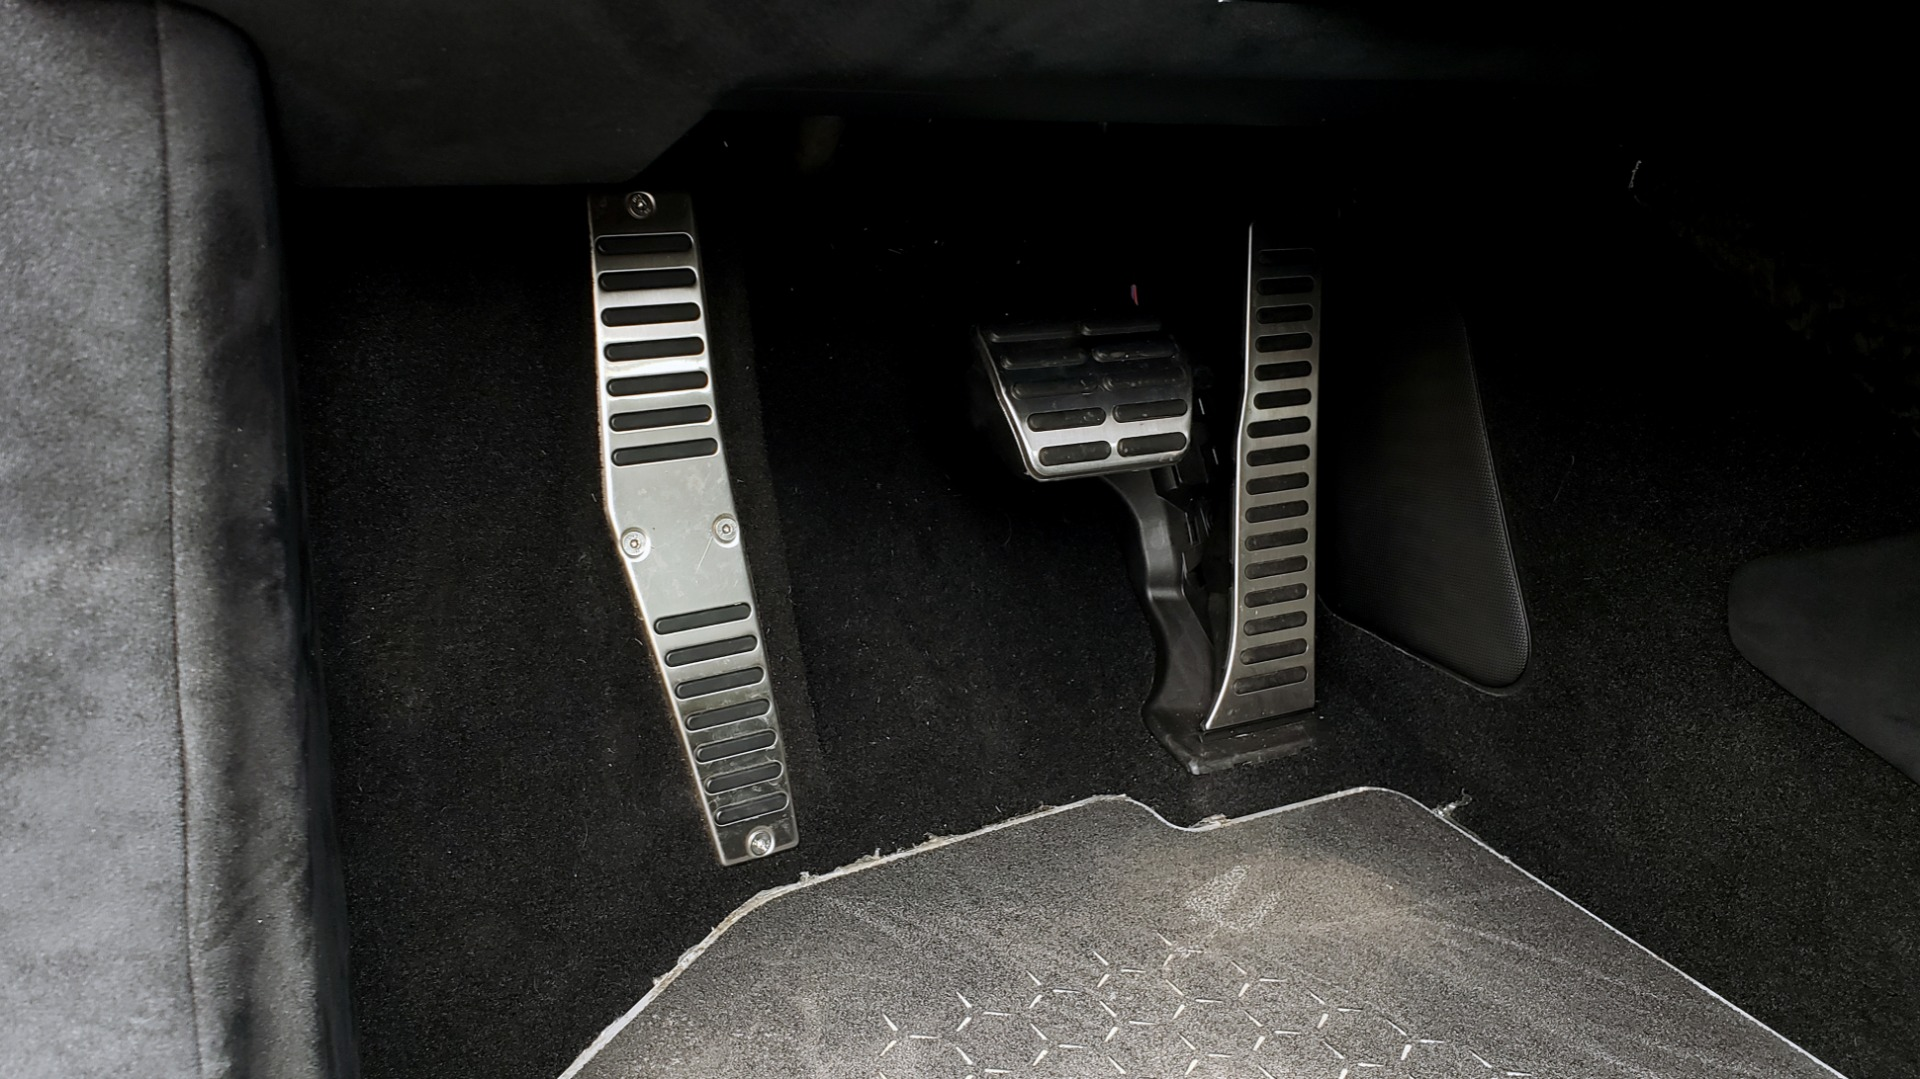 Used 2018 Lamborghini HURACAN PERFORMANTE 5.2L V10 / 630HP / 7-SPD AUTO / AWD / NAV / PREM SND for sale $269,995 at Formula Imports in Charlotte NC 28227 73